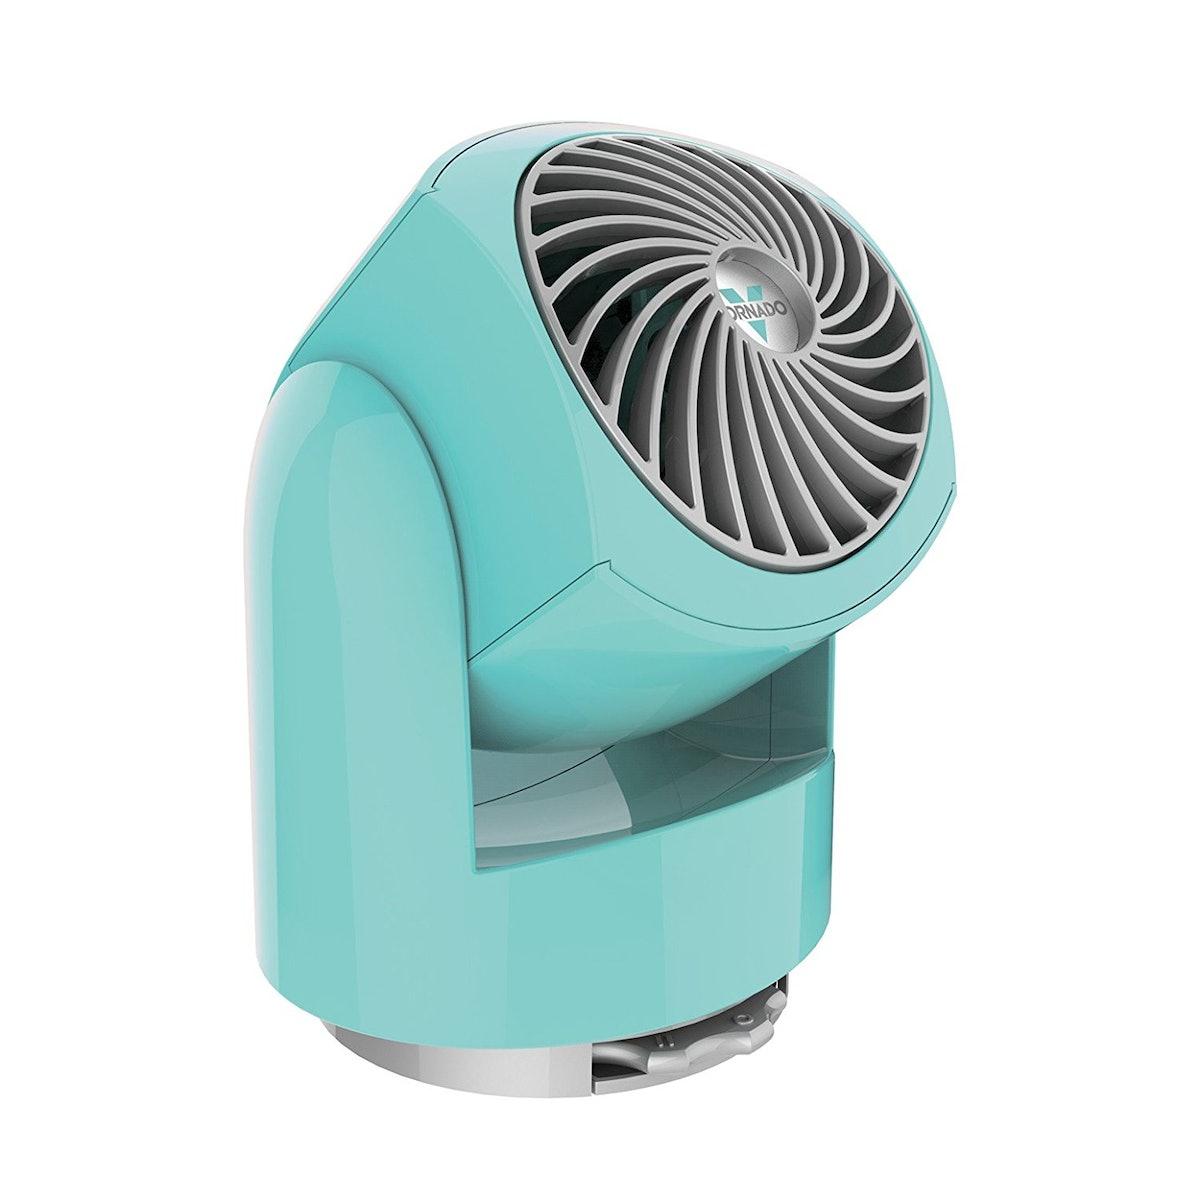 Vornado Flippi Personal Air Circulator Fan